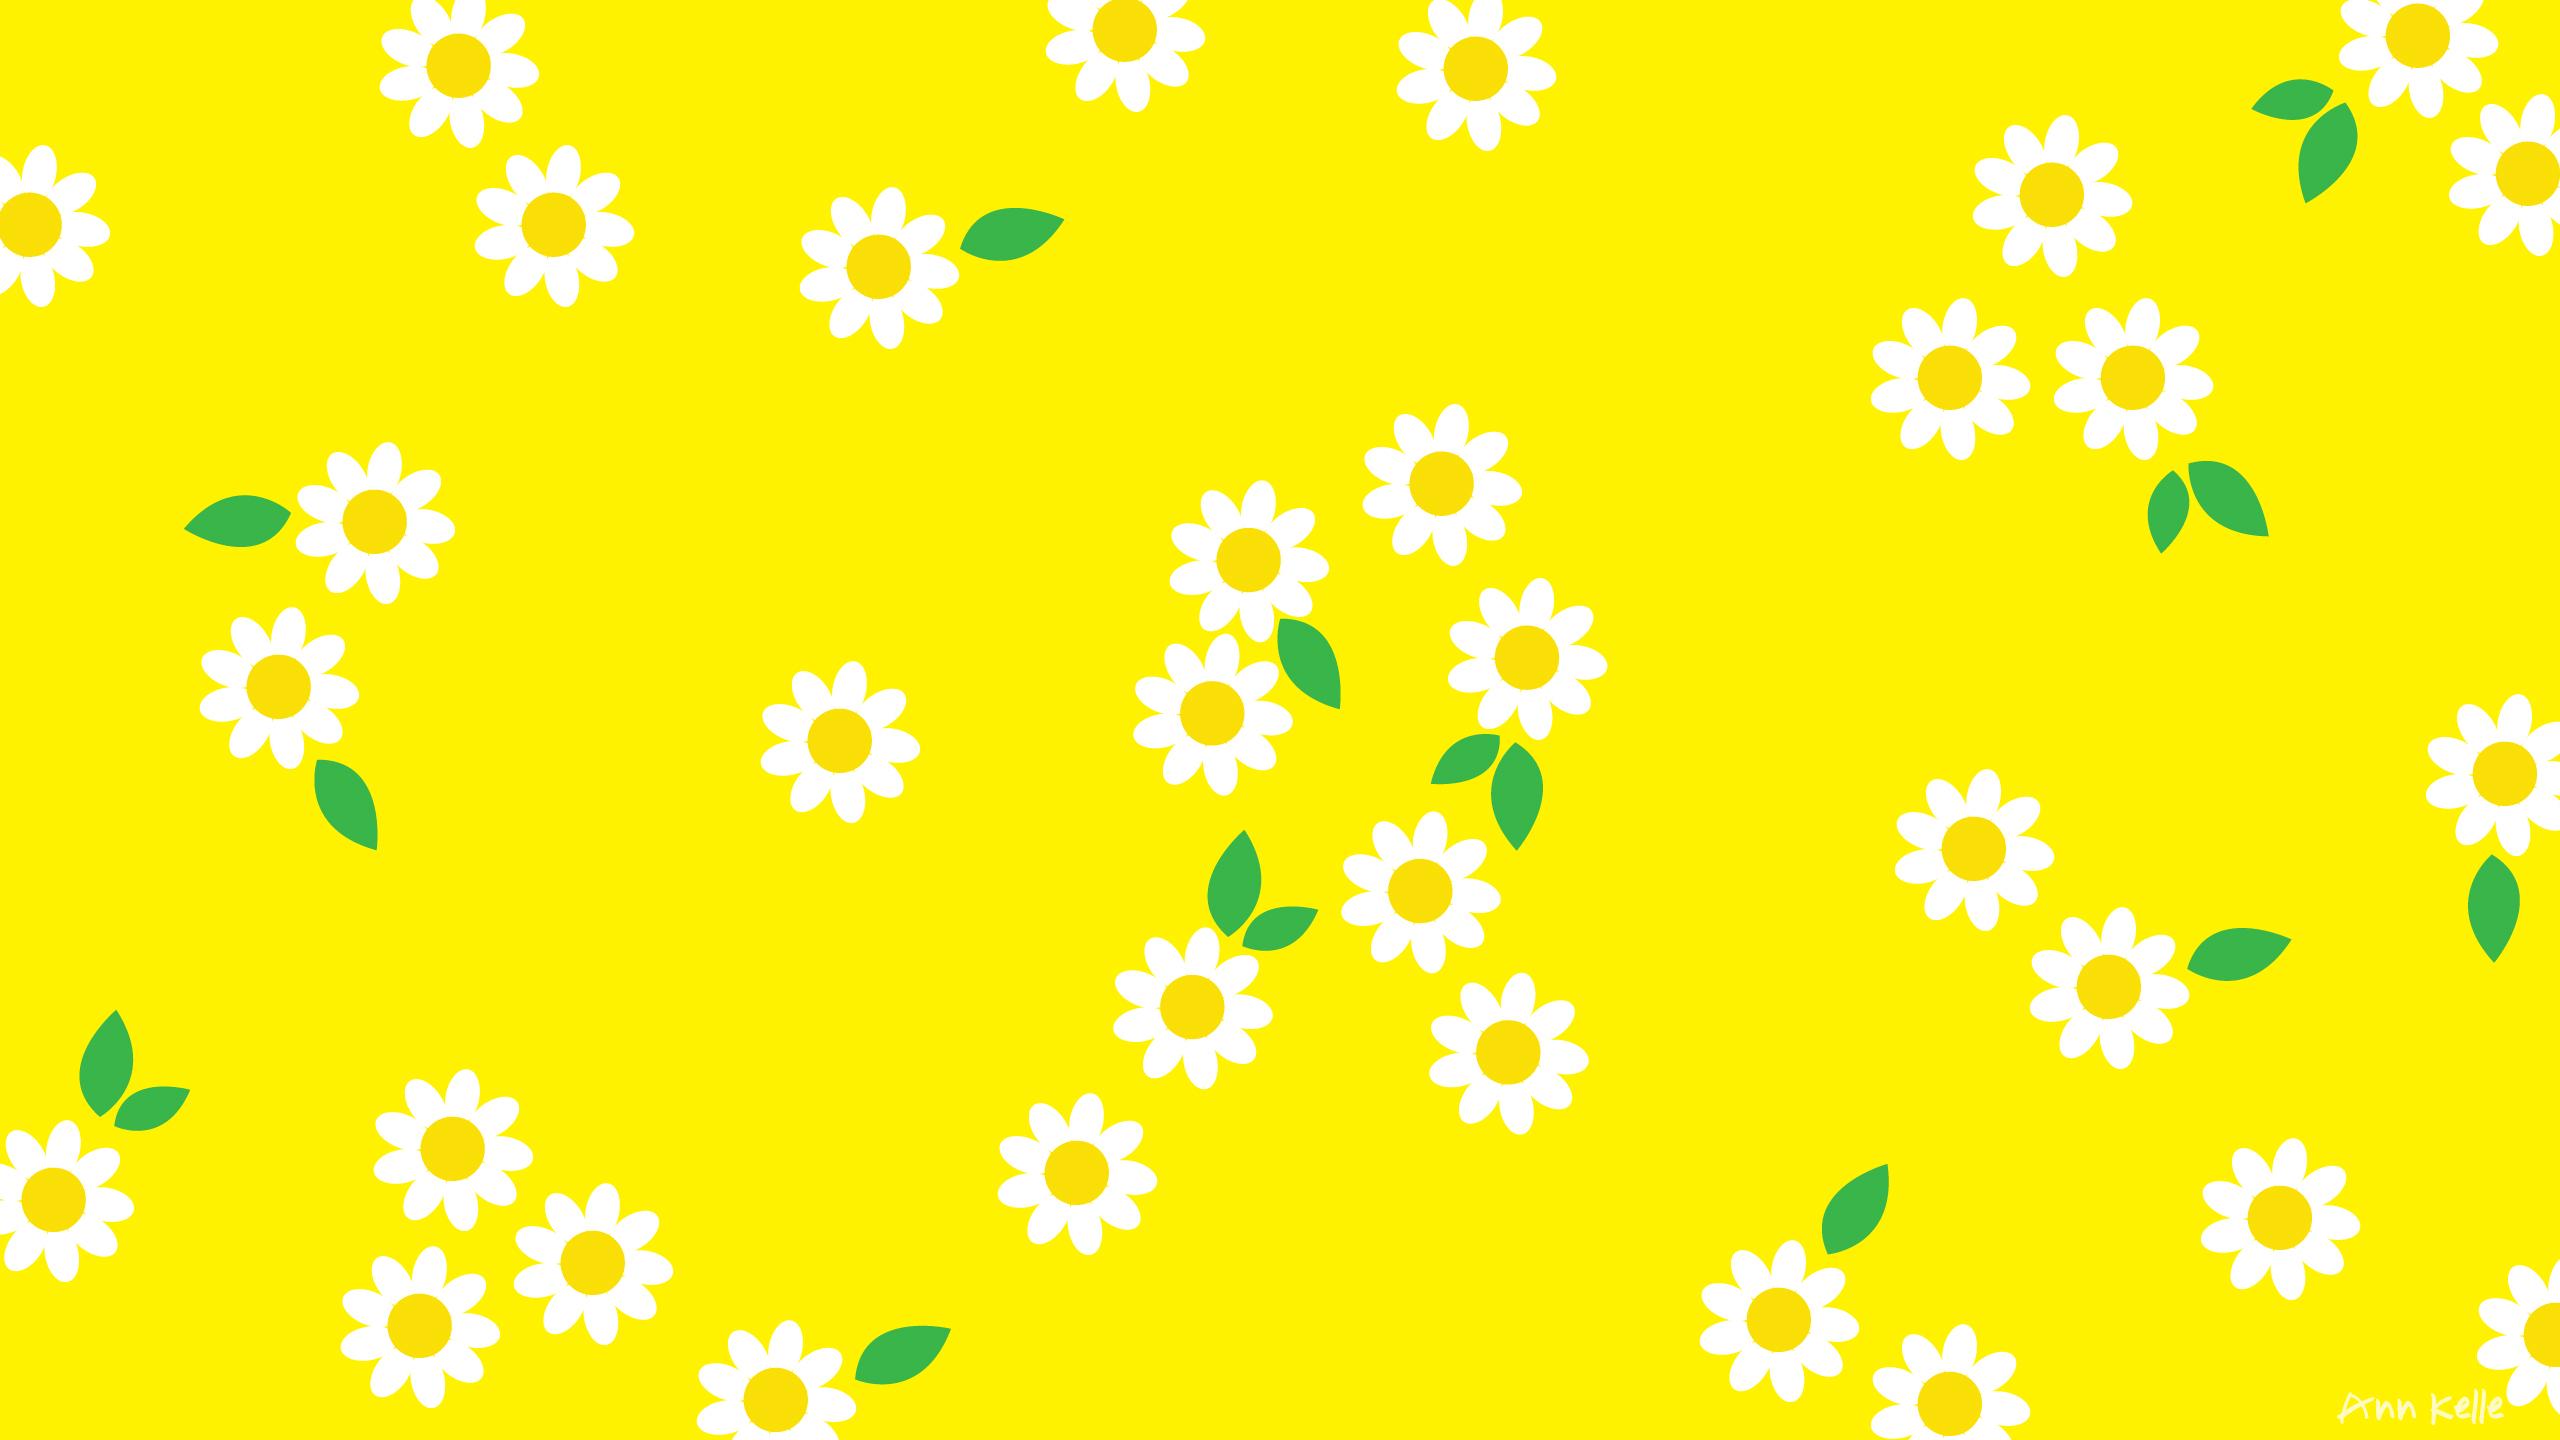 Aesthetic Background Desktop Yellow 2104737 Hd Wallpaper